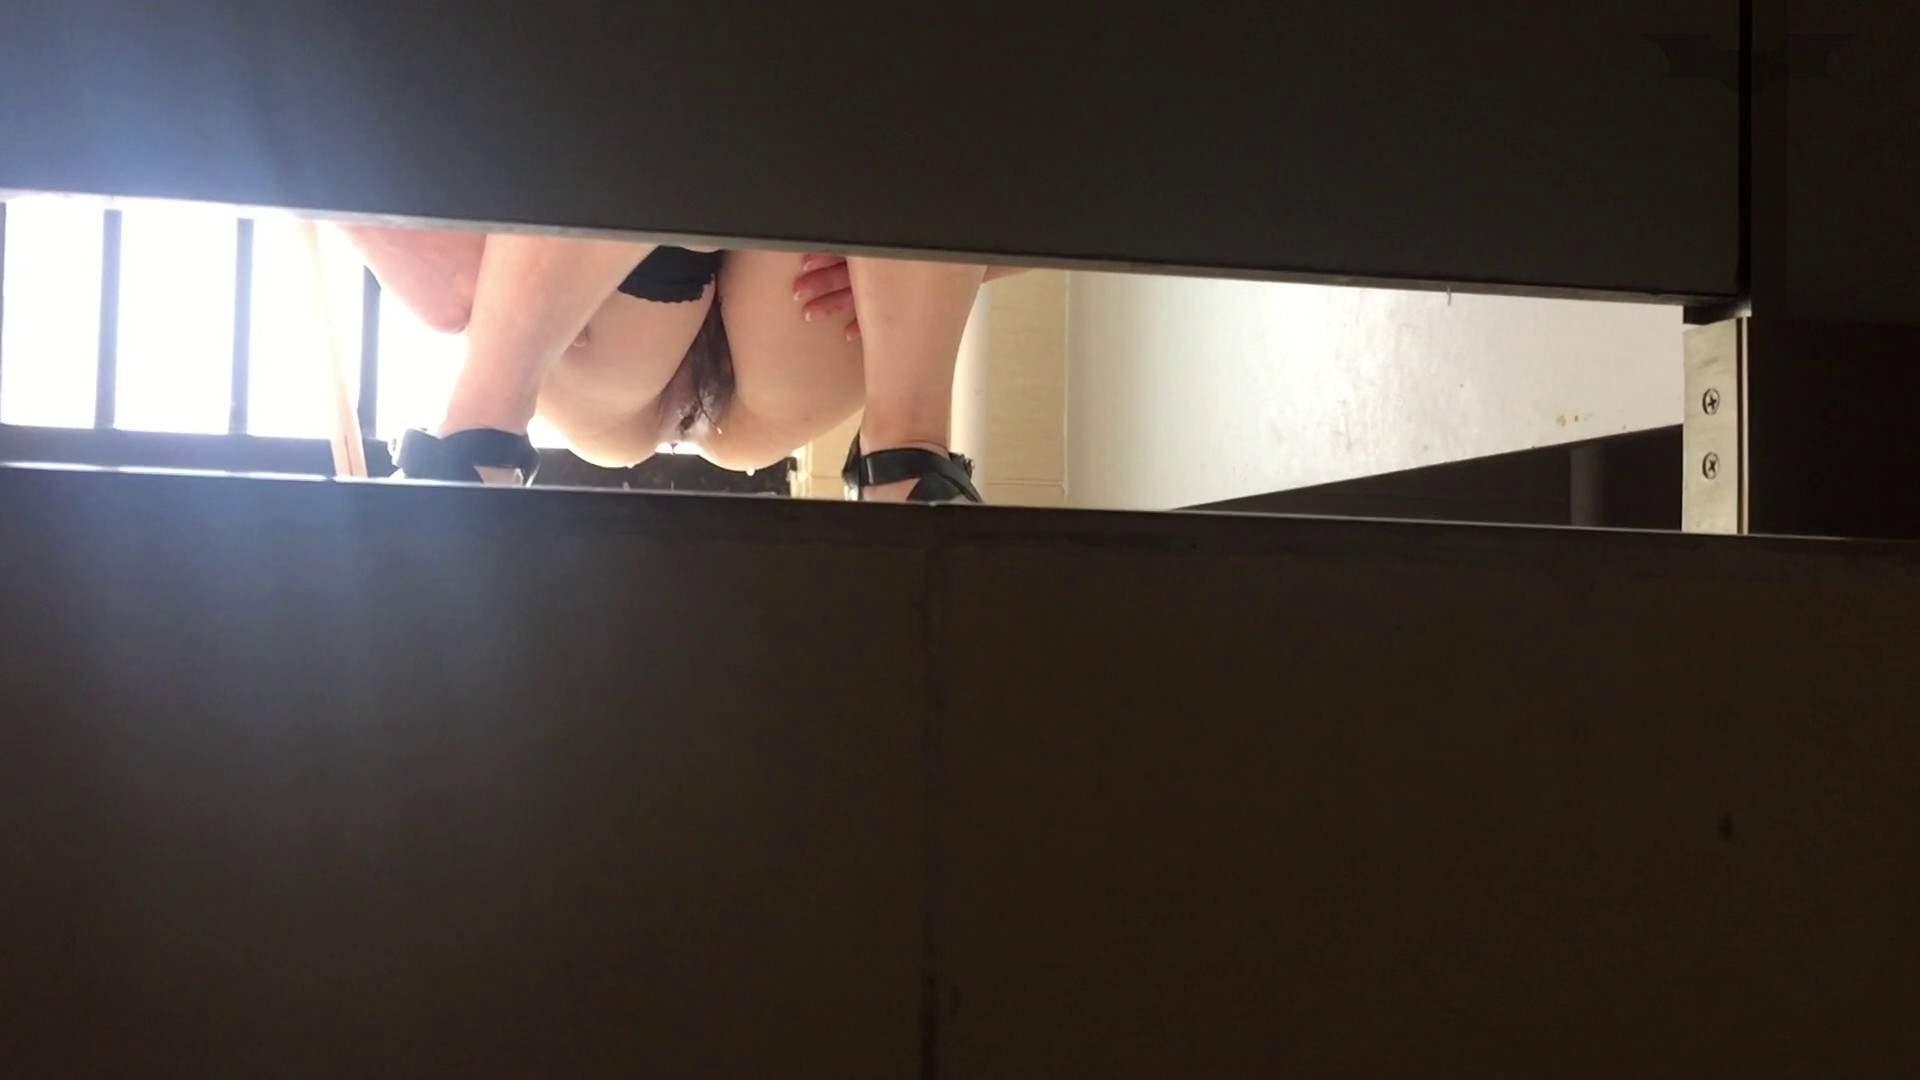 JD盗撮 美女の洗面所の秘密 Vol.73 ギャル攻め セックス画像 105画像 52